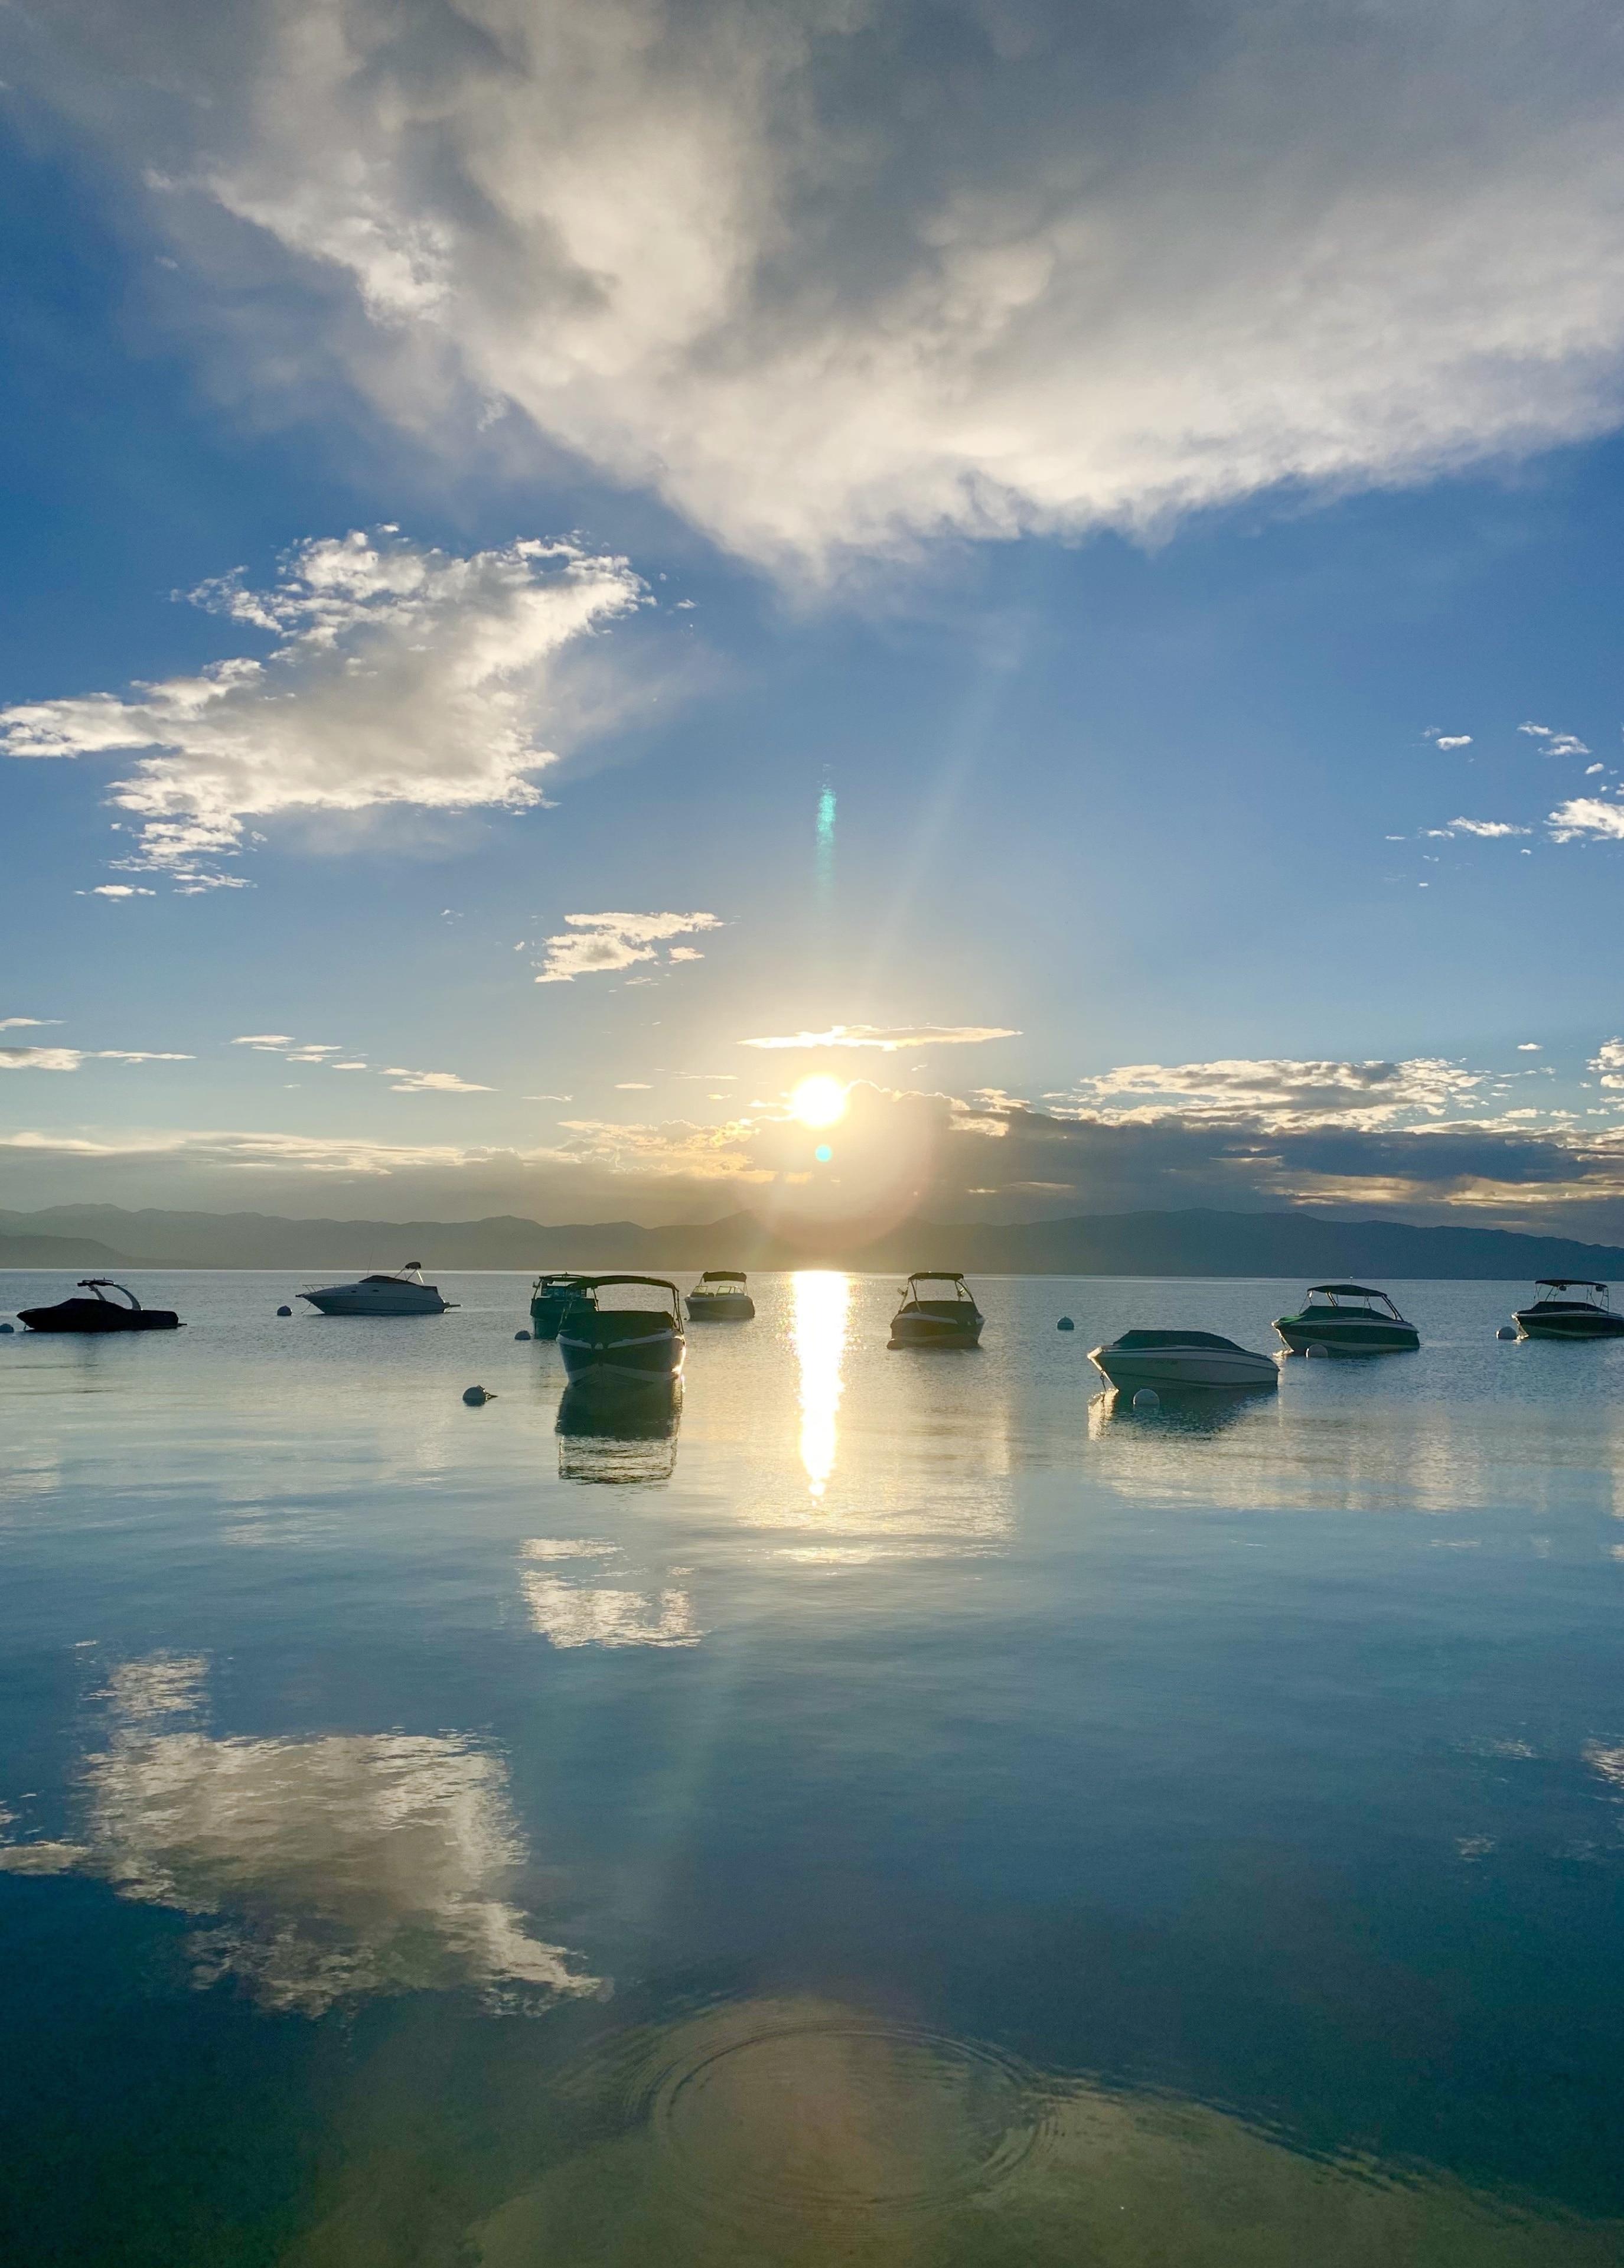 Sunnyside, California, United States of America